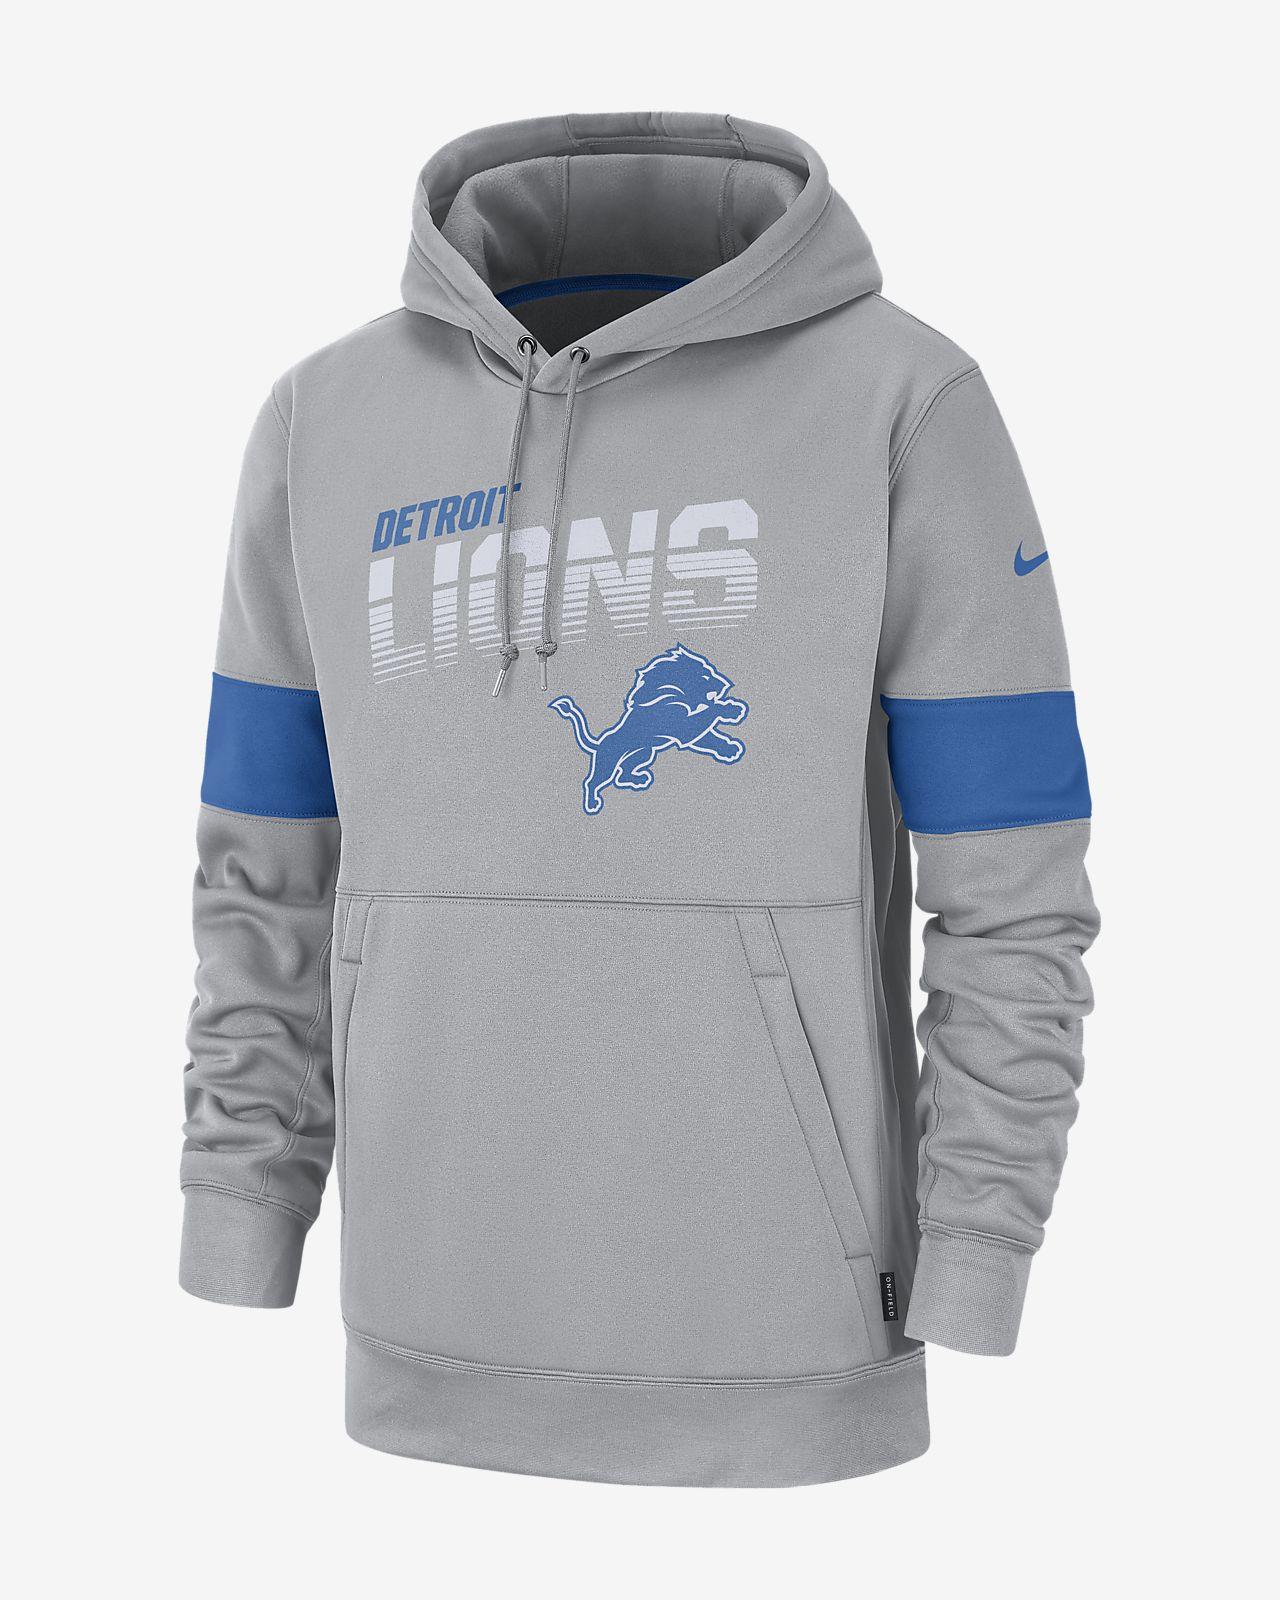 online retailer d59d8 8dcd4 Nike Therma (NFL Lions) Men's Hoodie